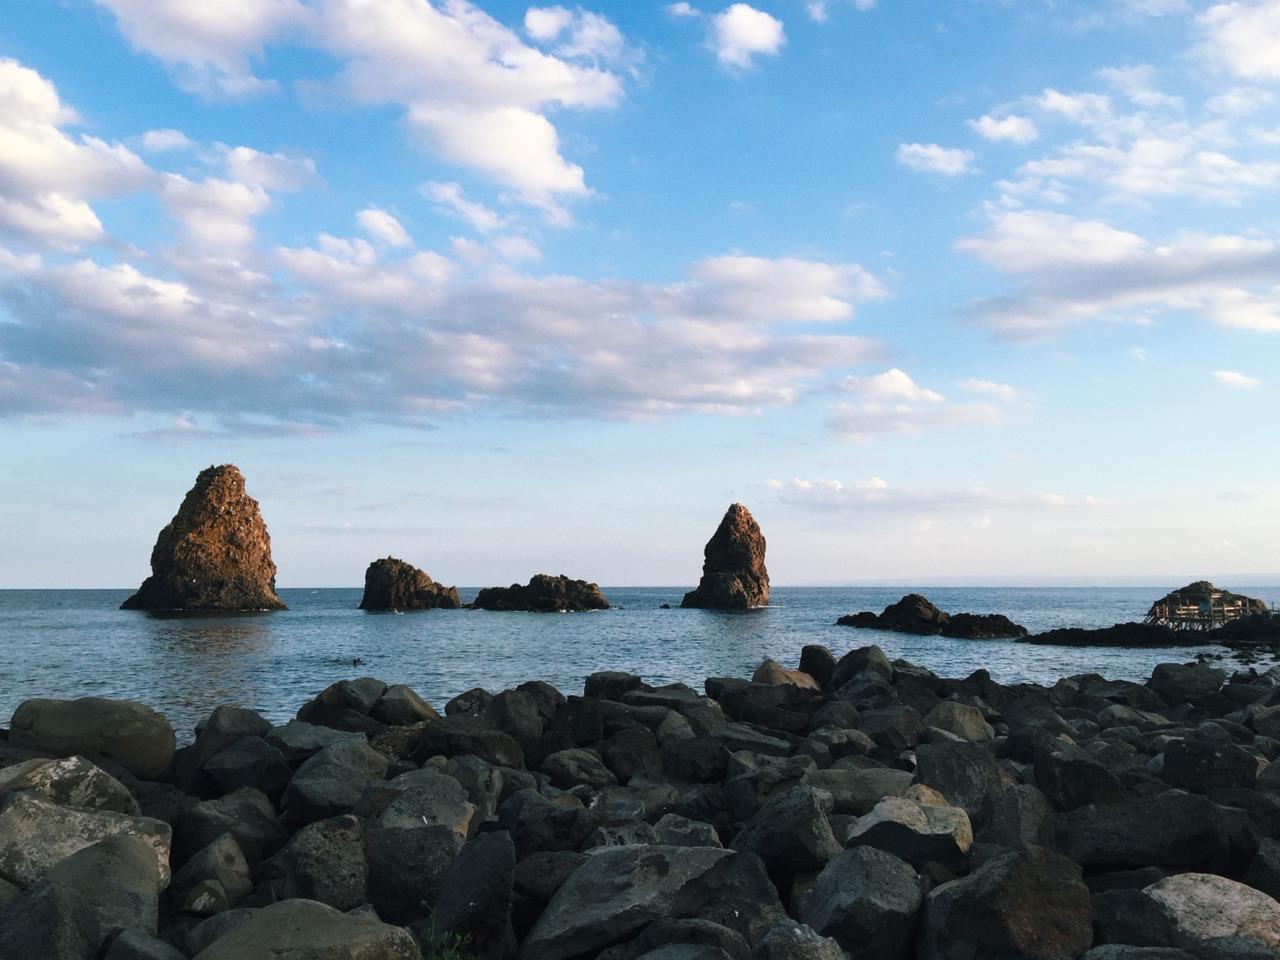 Day 6: Aci, Sicily